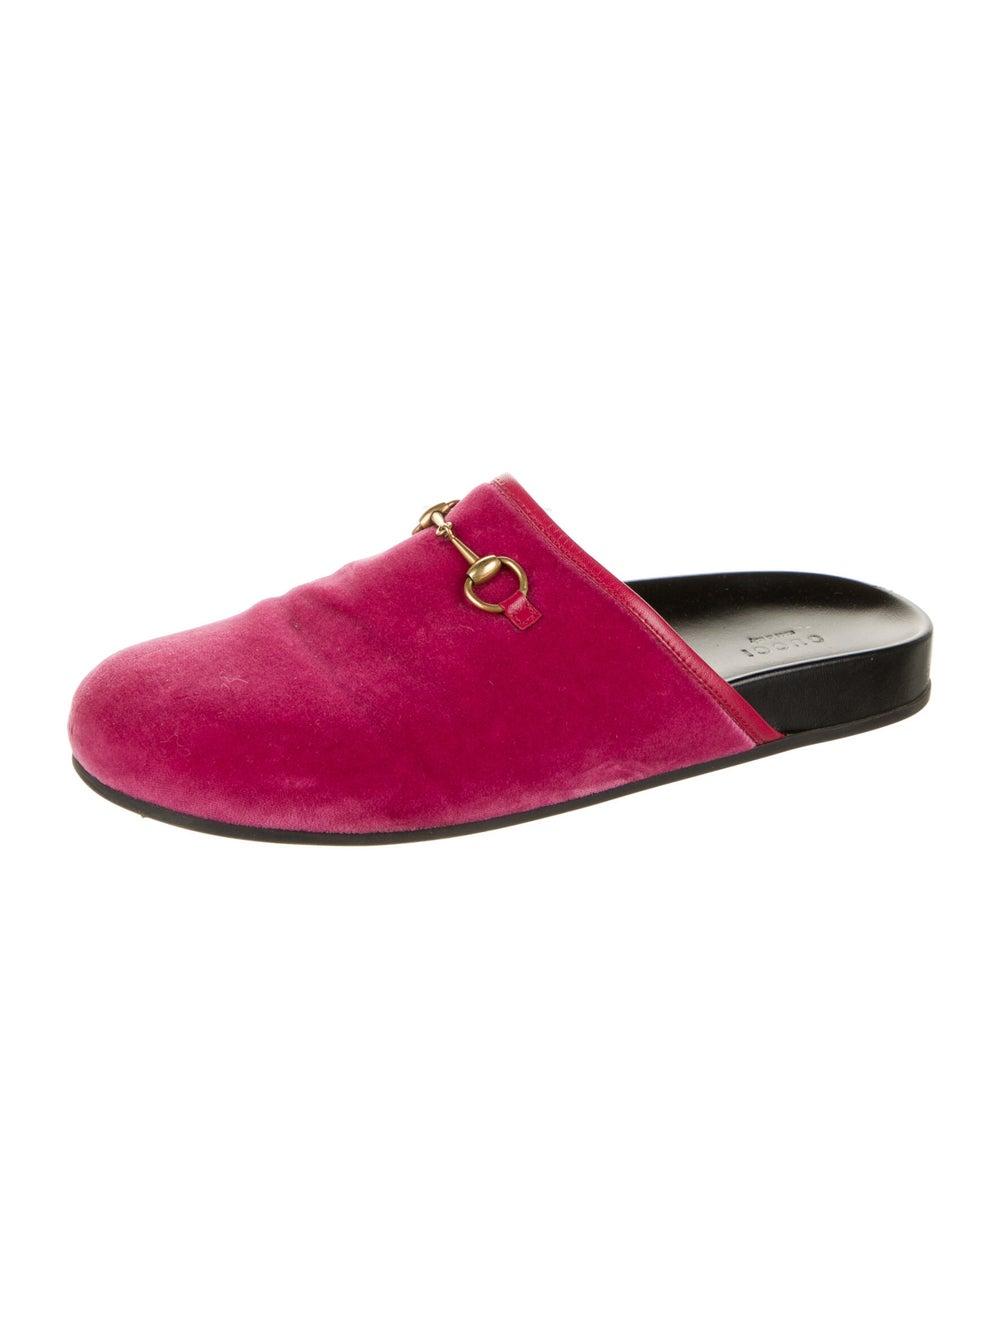 Gucci Horsebit Accent Mules Pink - image 2